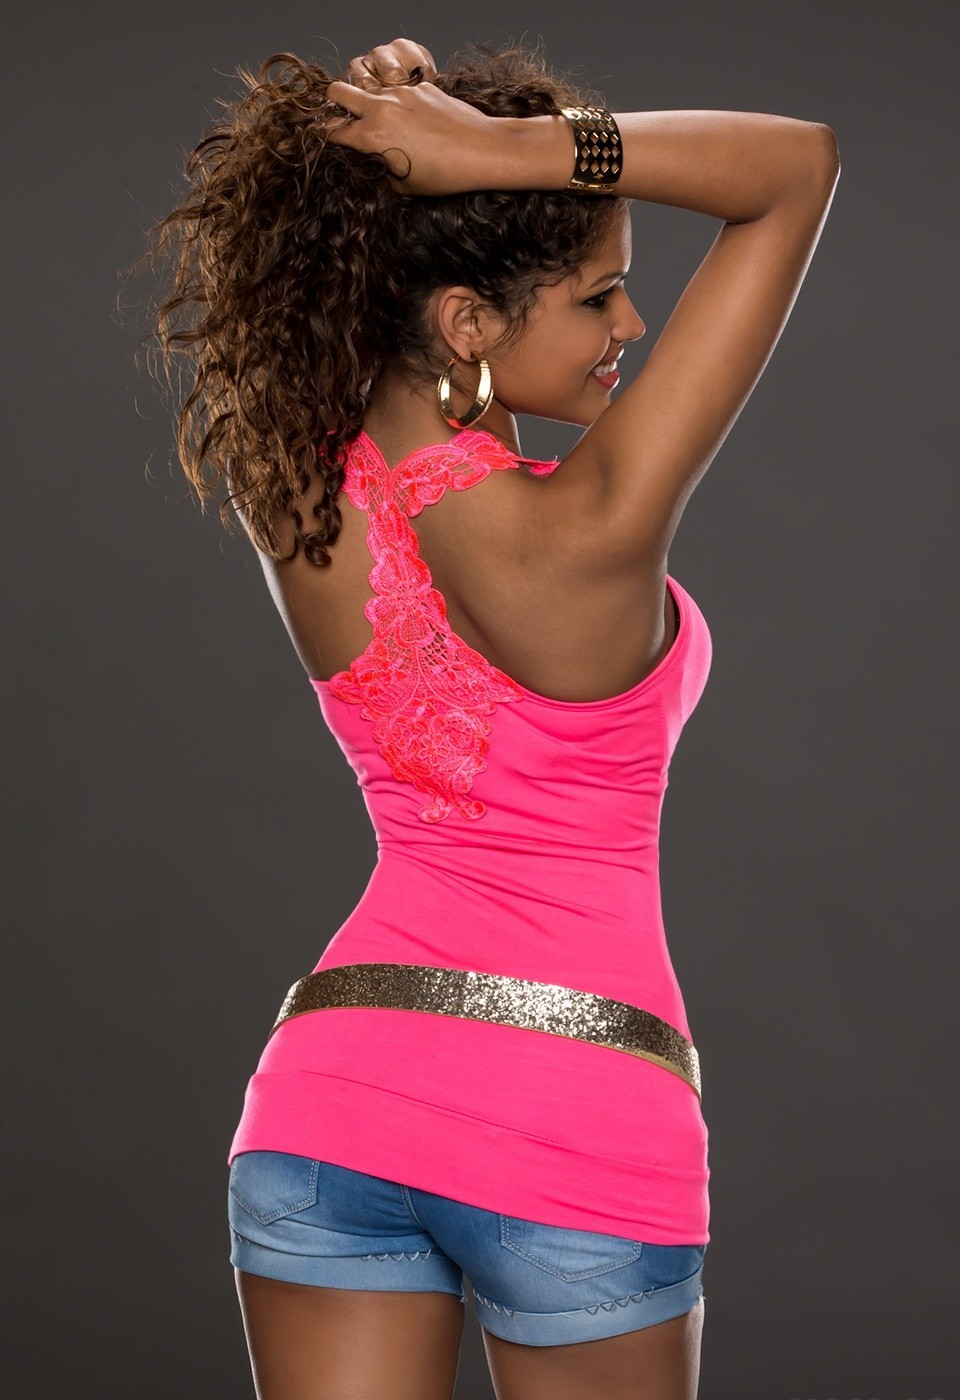 Sexy dámský top - růžový (Dámský top)